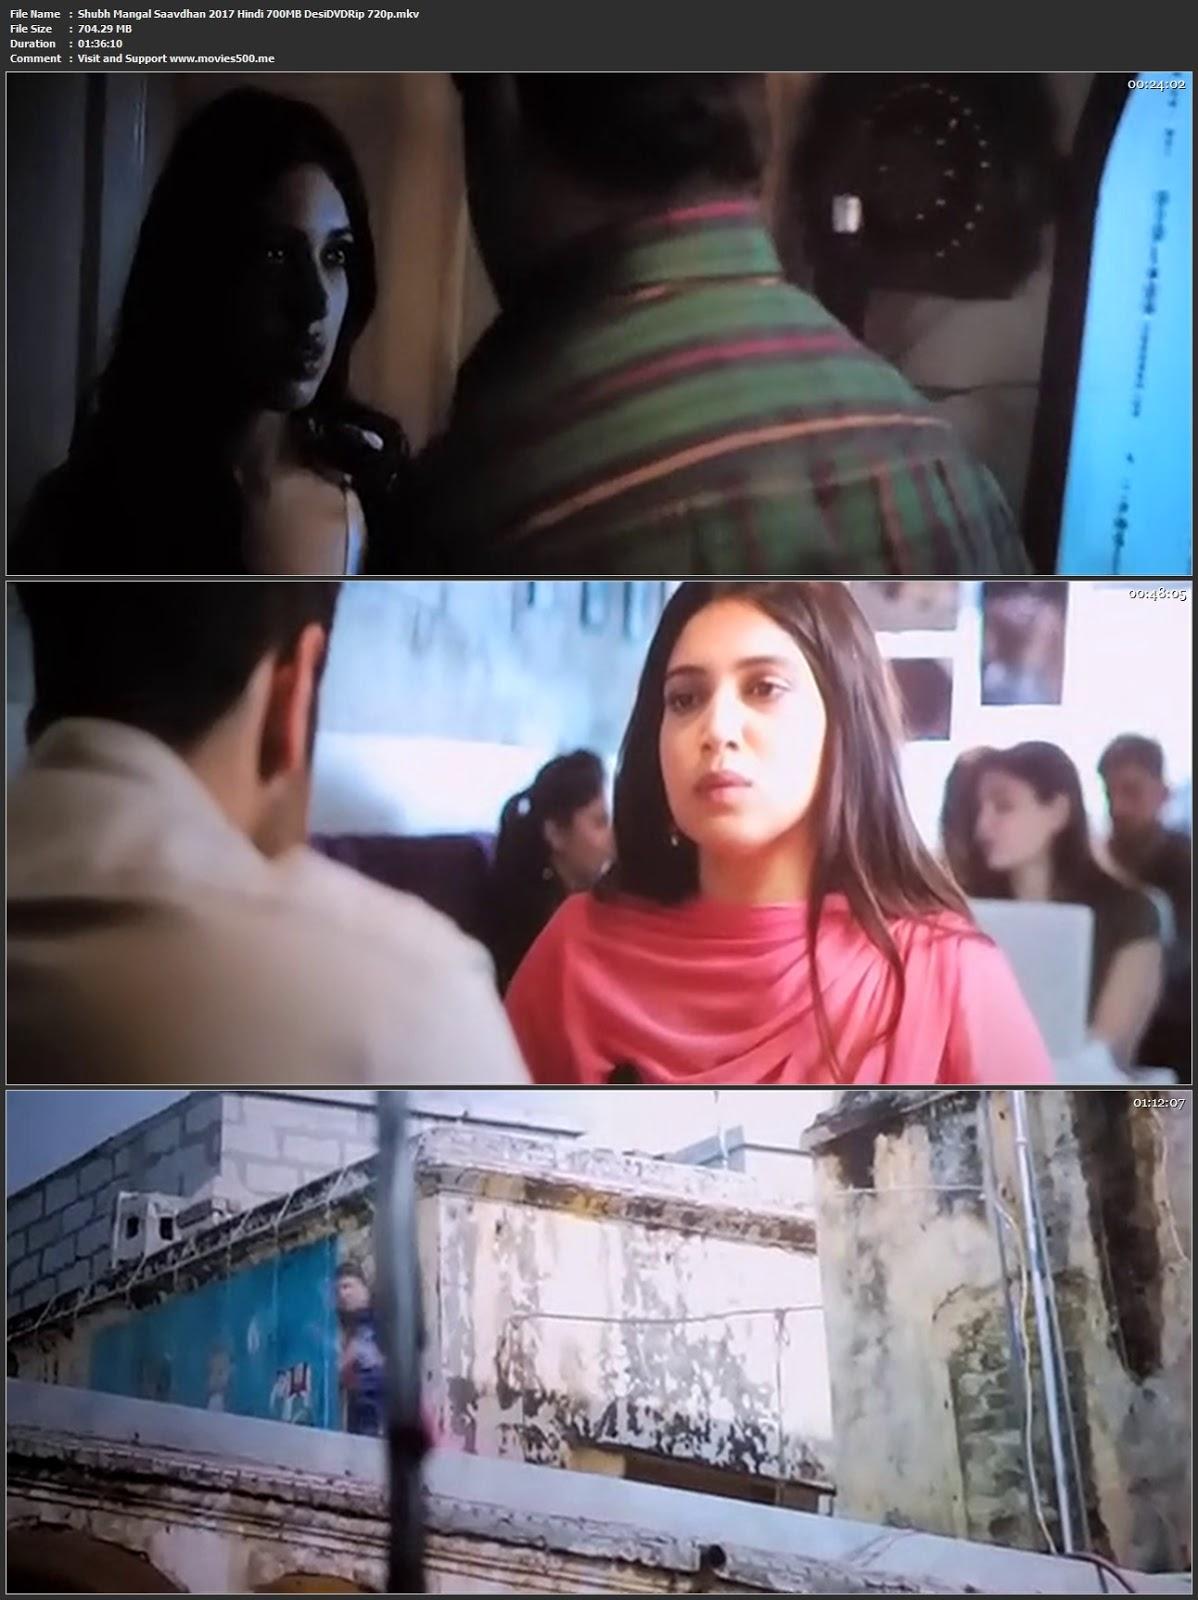 Shubh Mangal Saavdhan 2017 Hindi Movie Desi DVDRip 720p at movies500.site